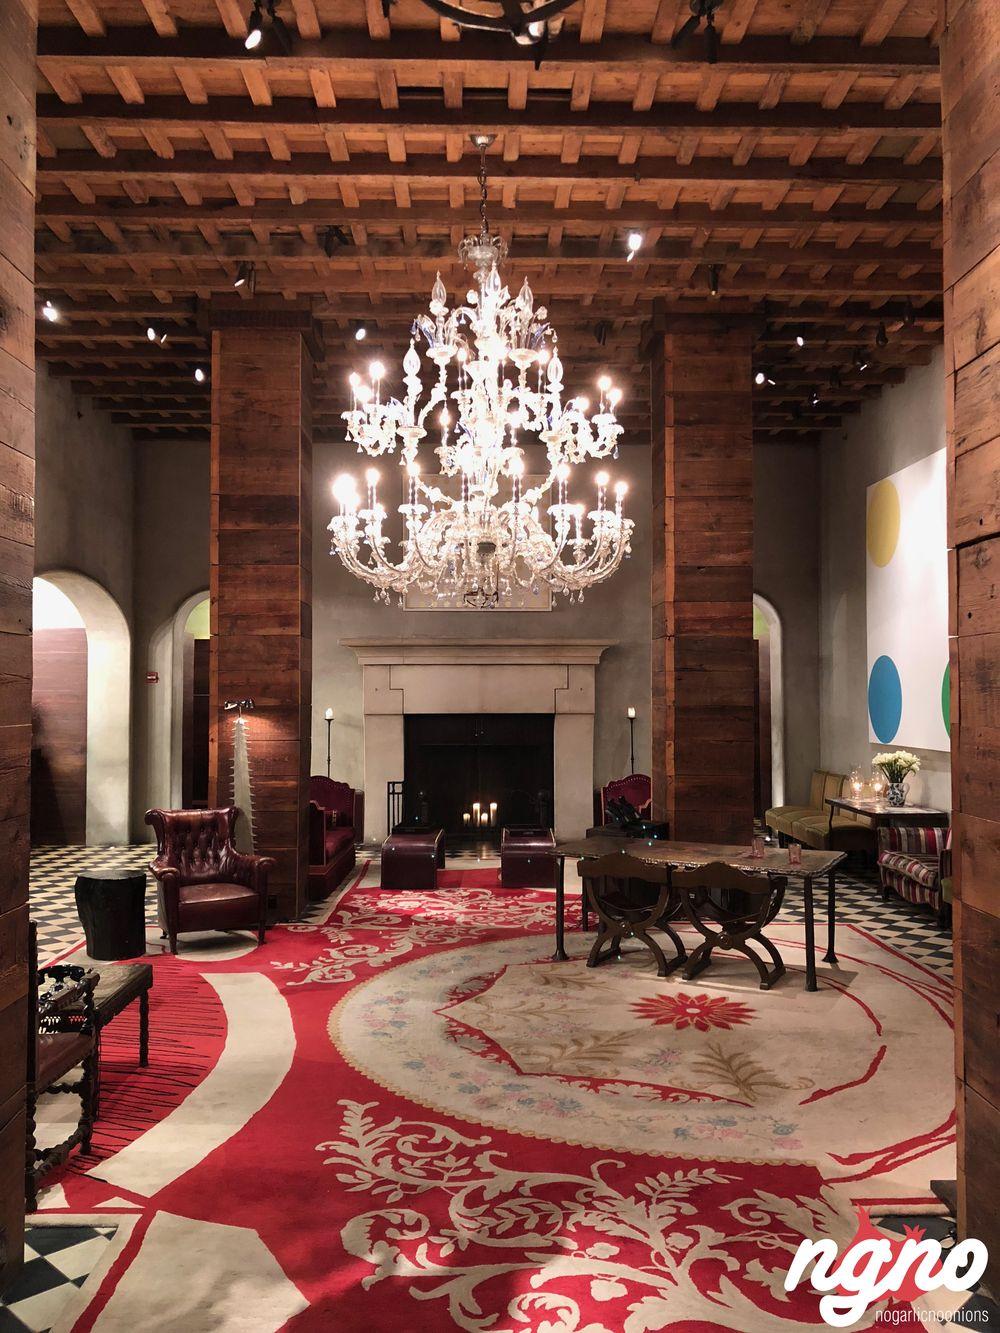 gramercy-park-hotel2019-01-06-05-50-07